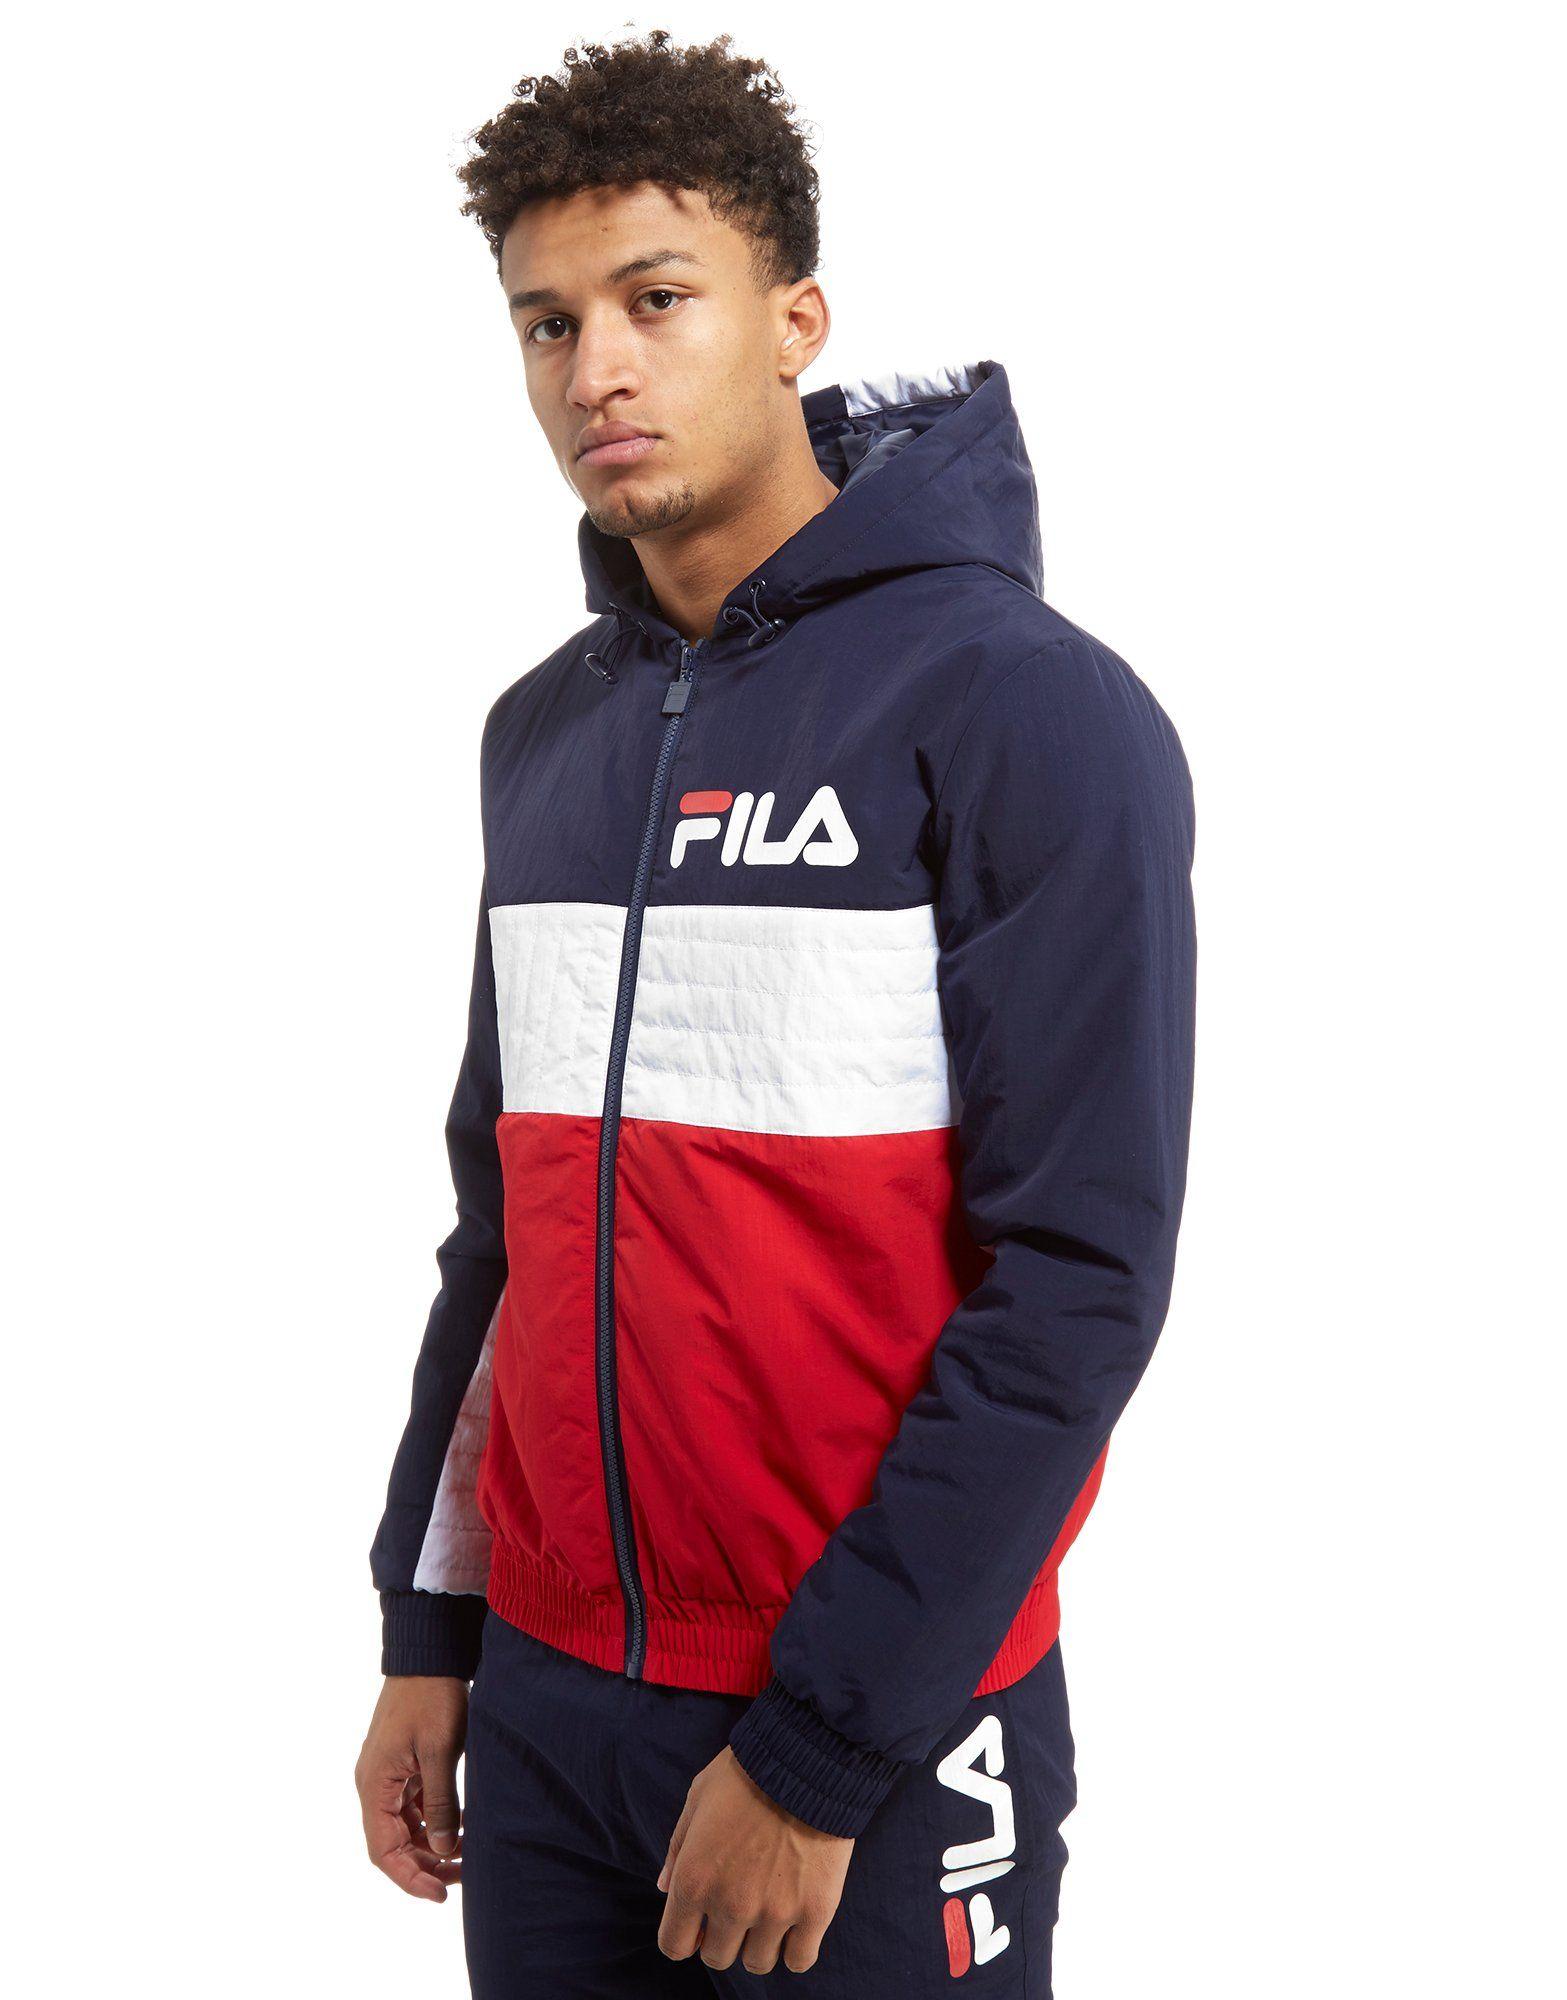 Fila Polo Fashion Men